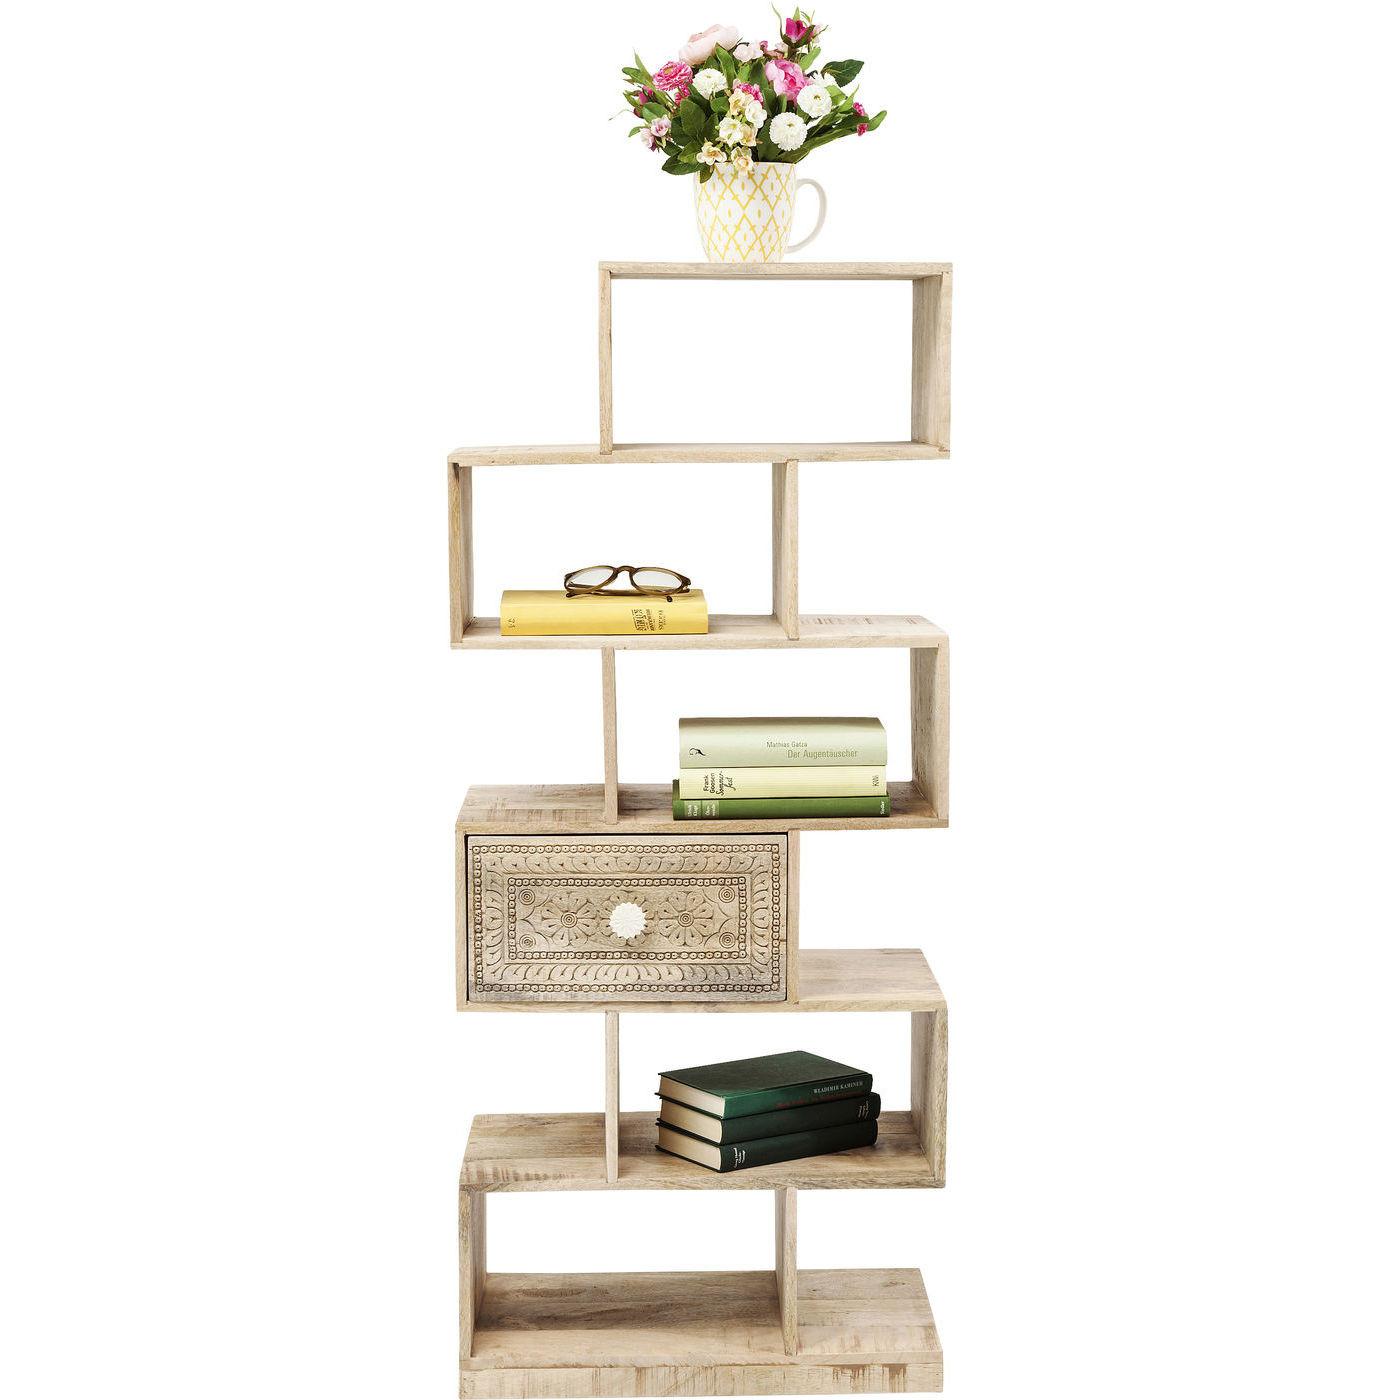 regal puro zick zack kare design mutoni m bel. Black Bedroom Furniture Sets. Home Design Ideas